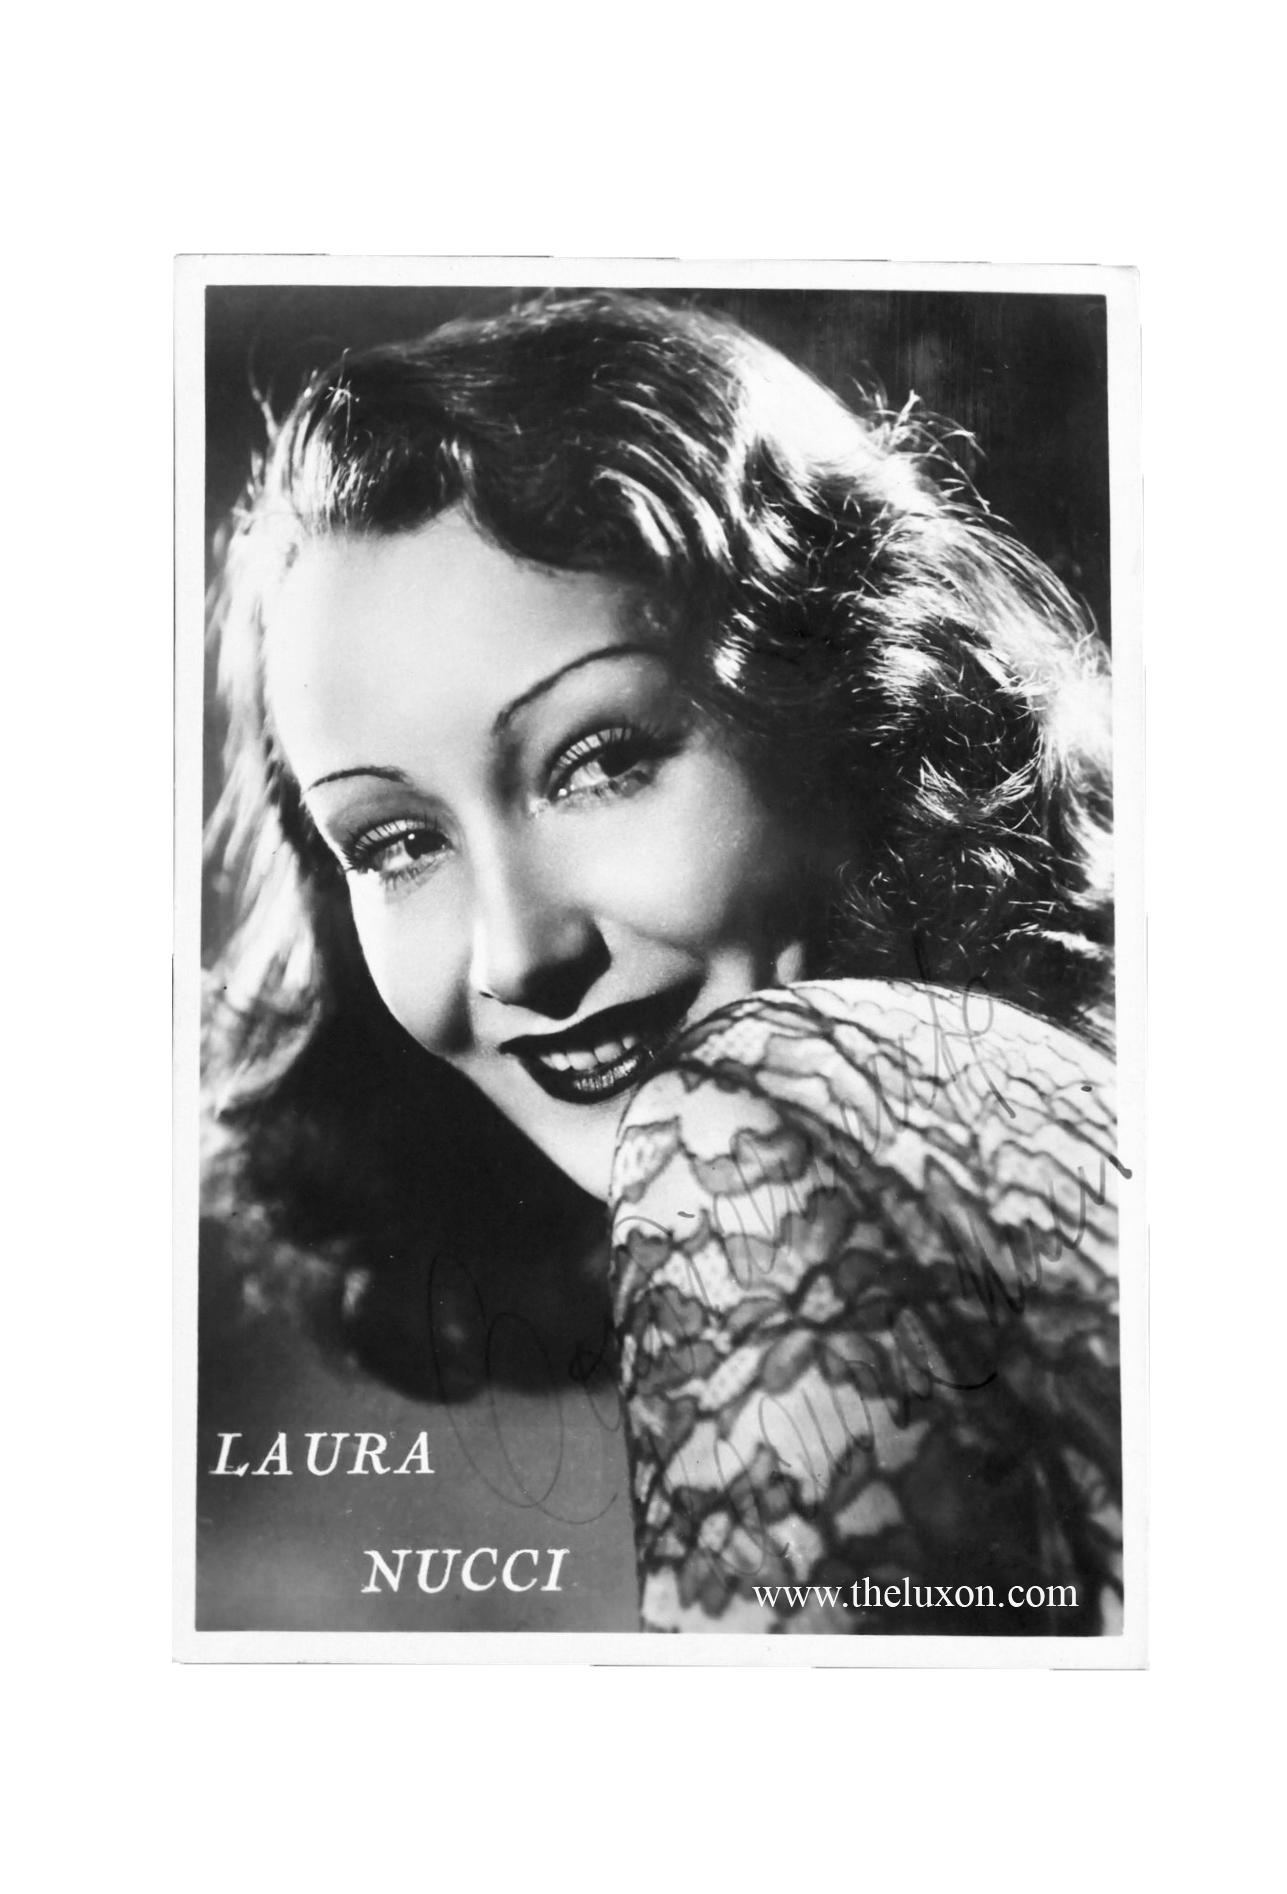 laura nucci italian actress cinema movie vintage photography fashion makeup history hair 40s fascist divas